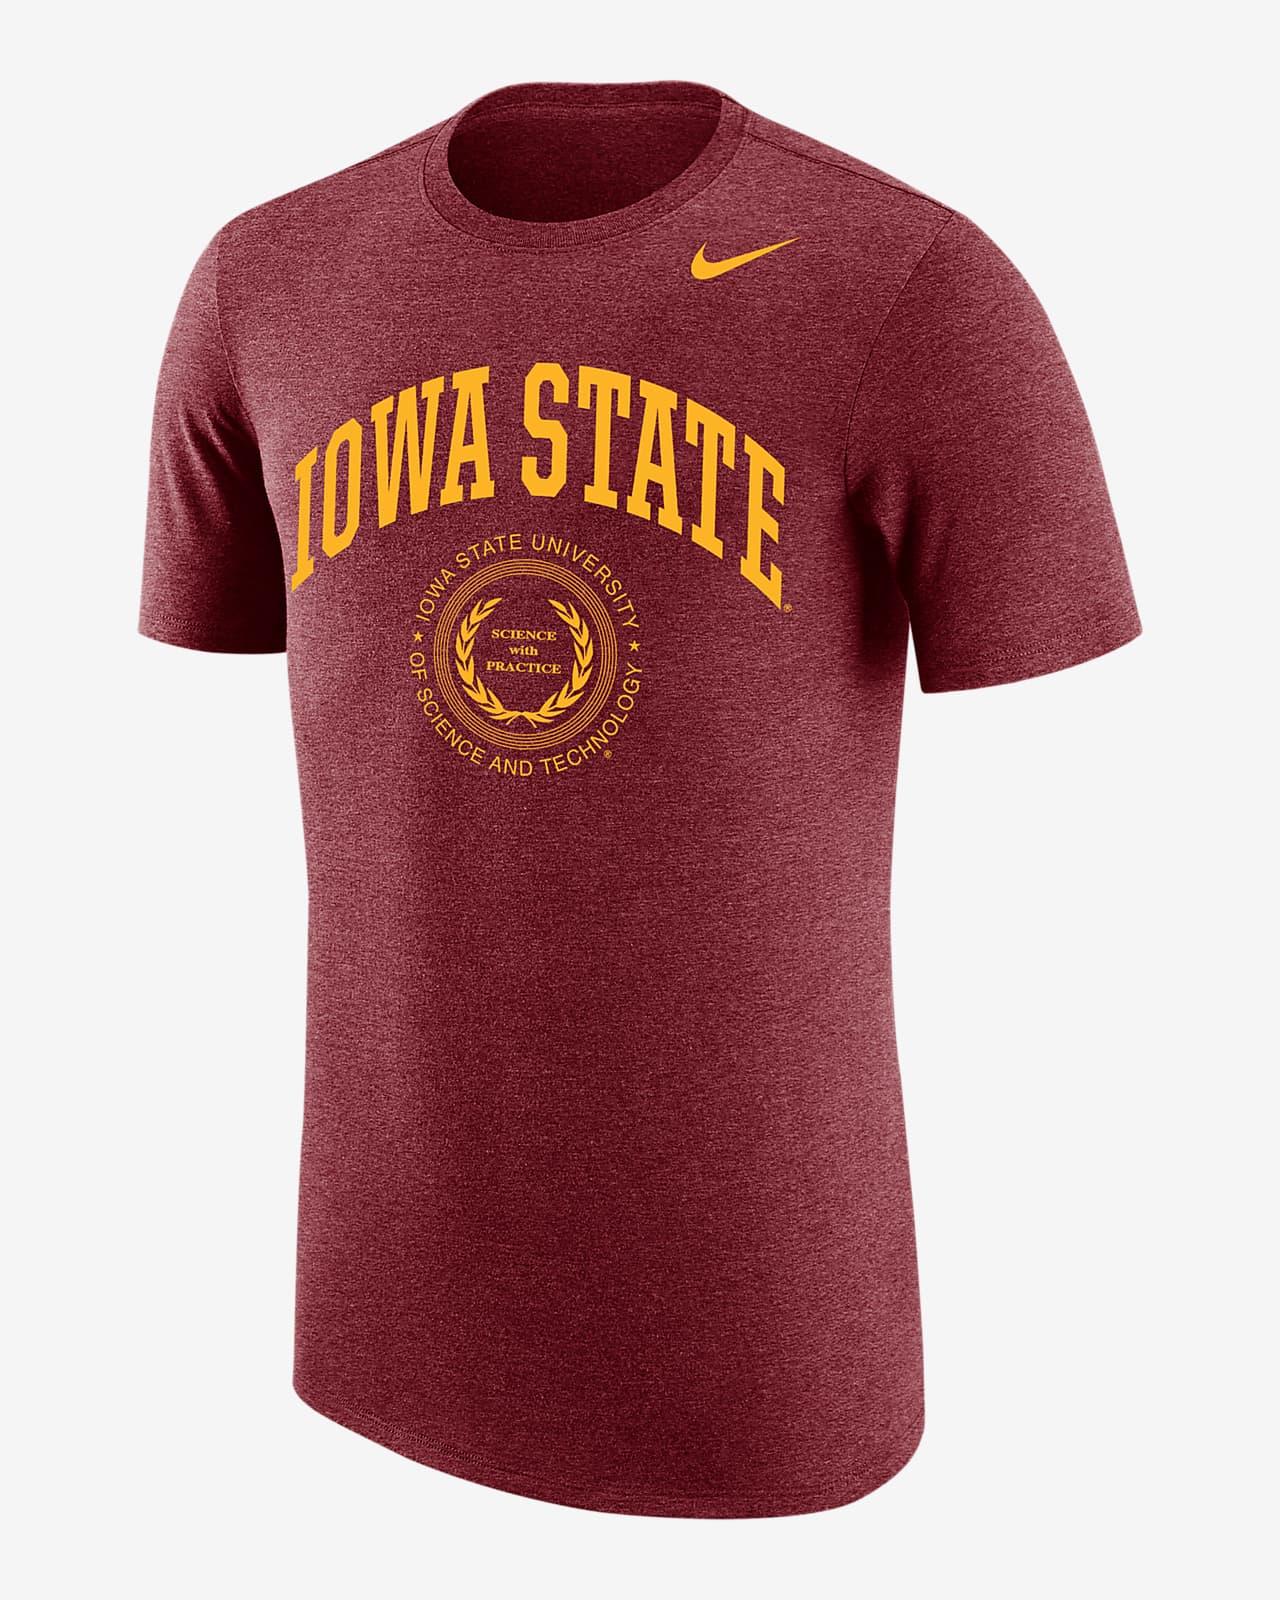 Nike College (Iowa State) Men's T-Shirt